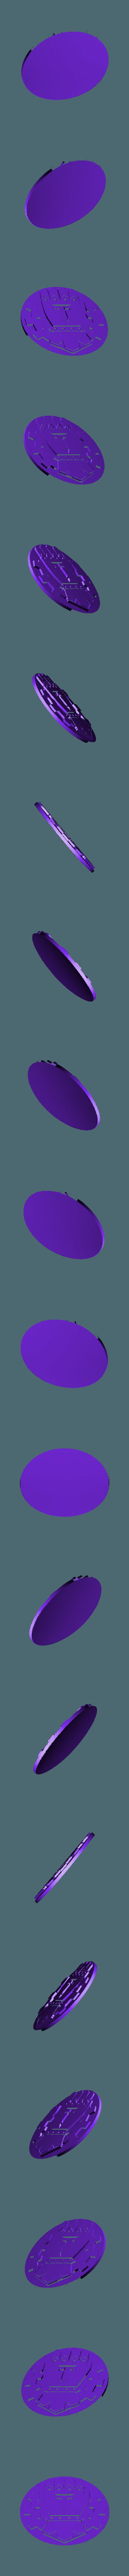 LEGIO_CRUCIUS_SYMBOL.stl Download free STL file Logo Pack - Carapace • Design to 3D print, yaemhay